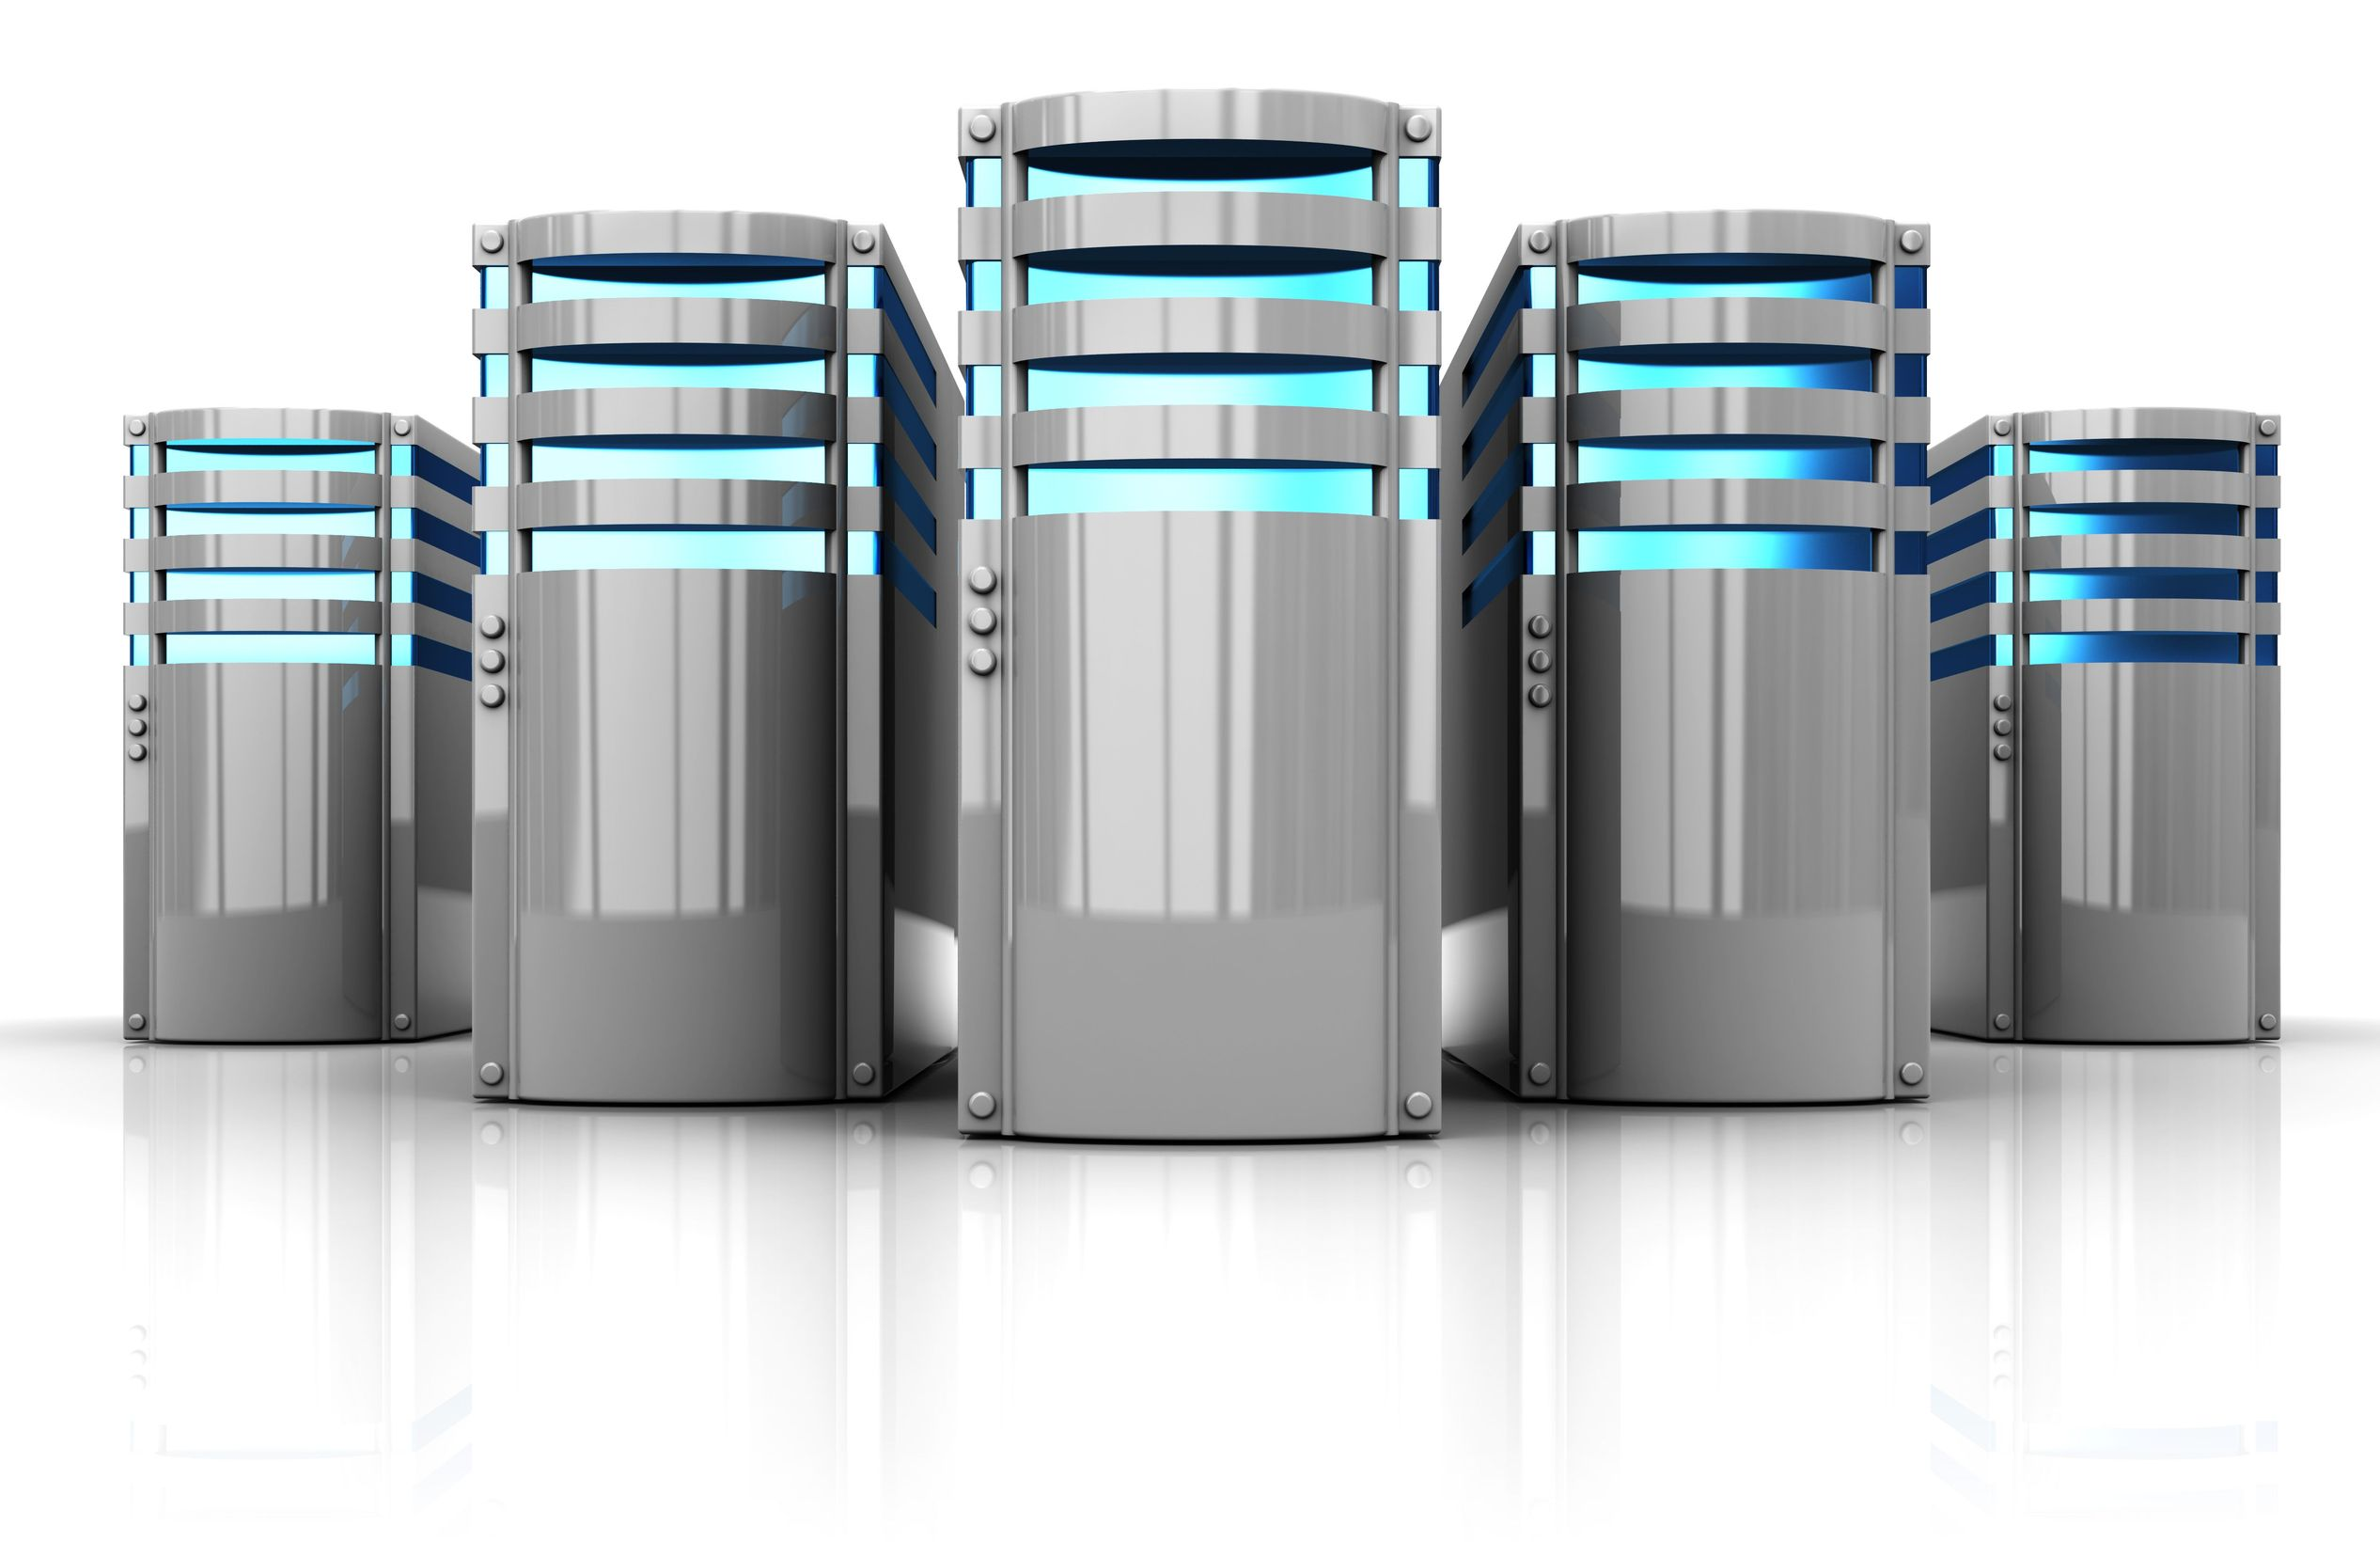 Types of hosting explained